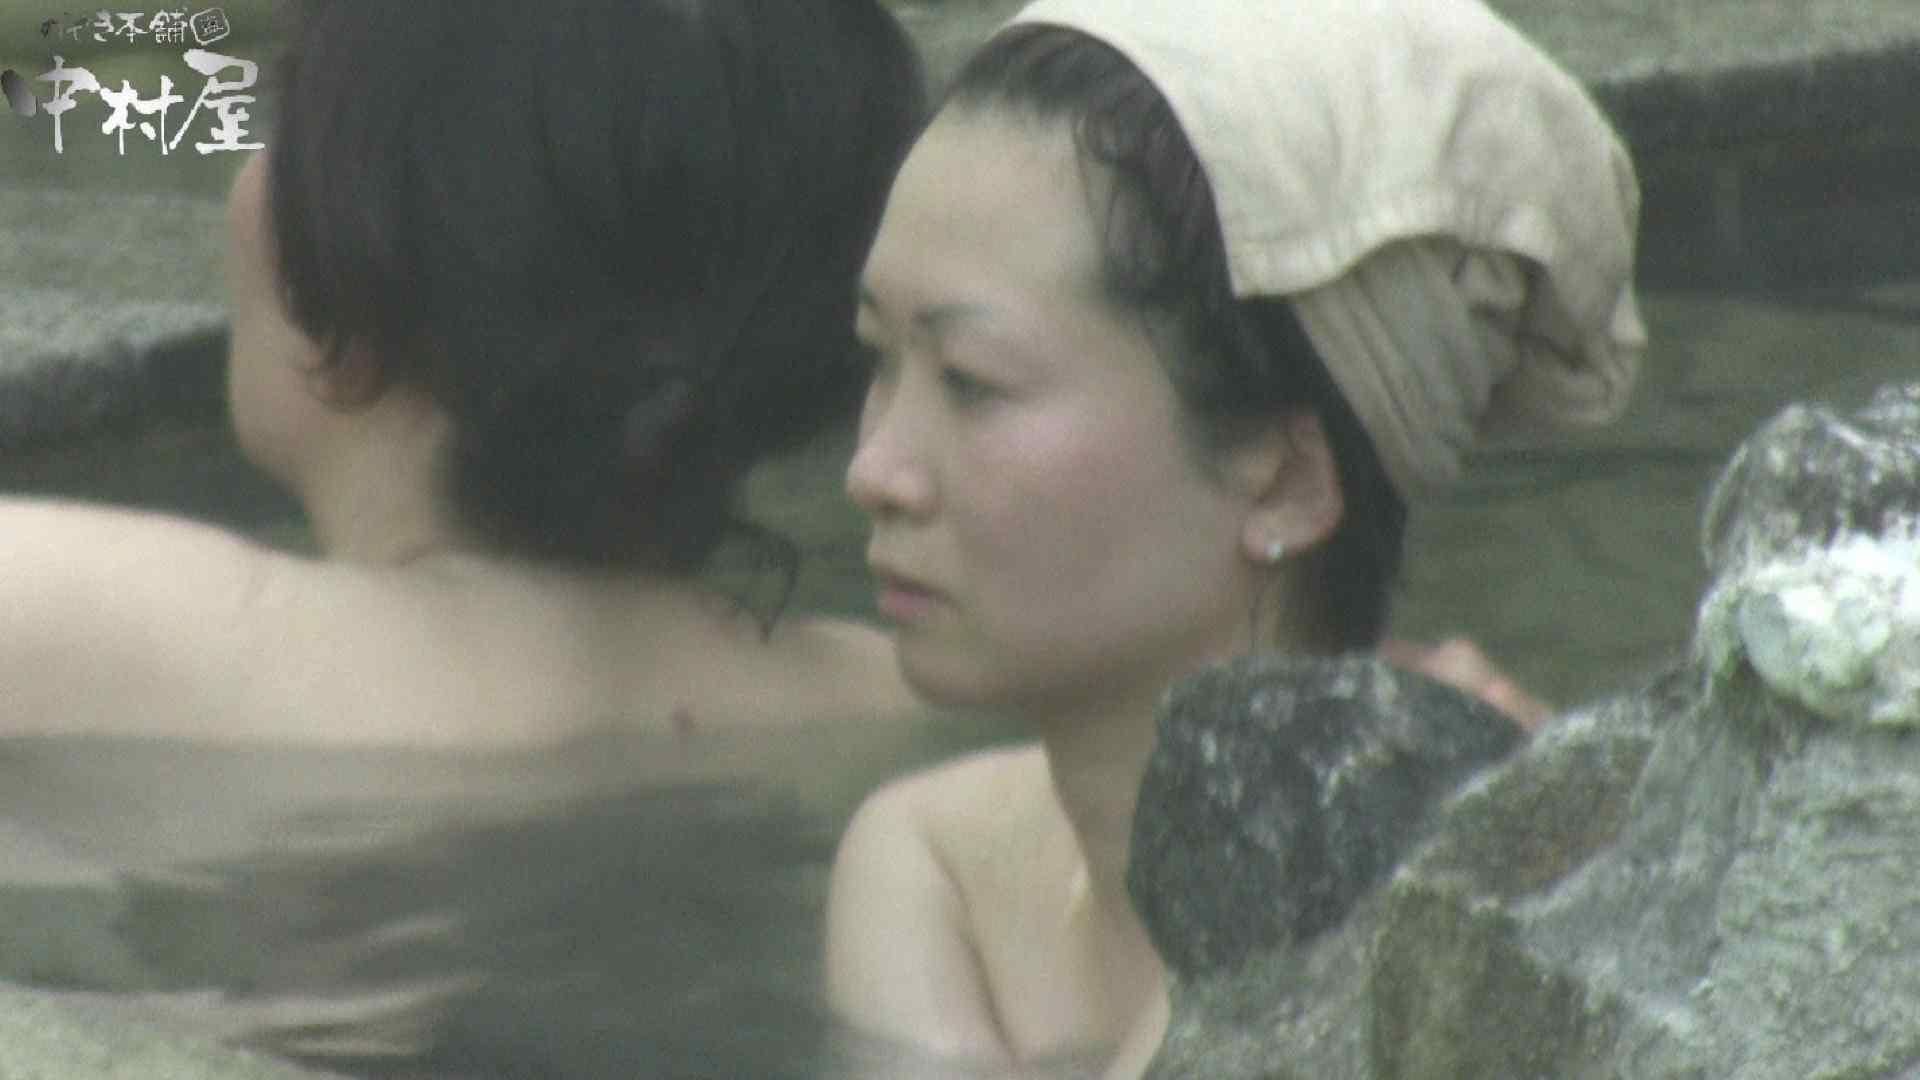 Aquaな露天風呂Vol.906 露天風呂編 | 盗撮シリーズ  86PIX 85